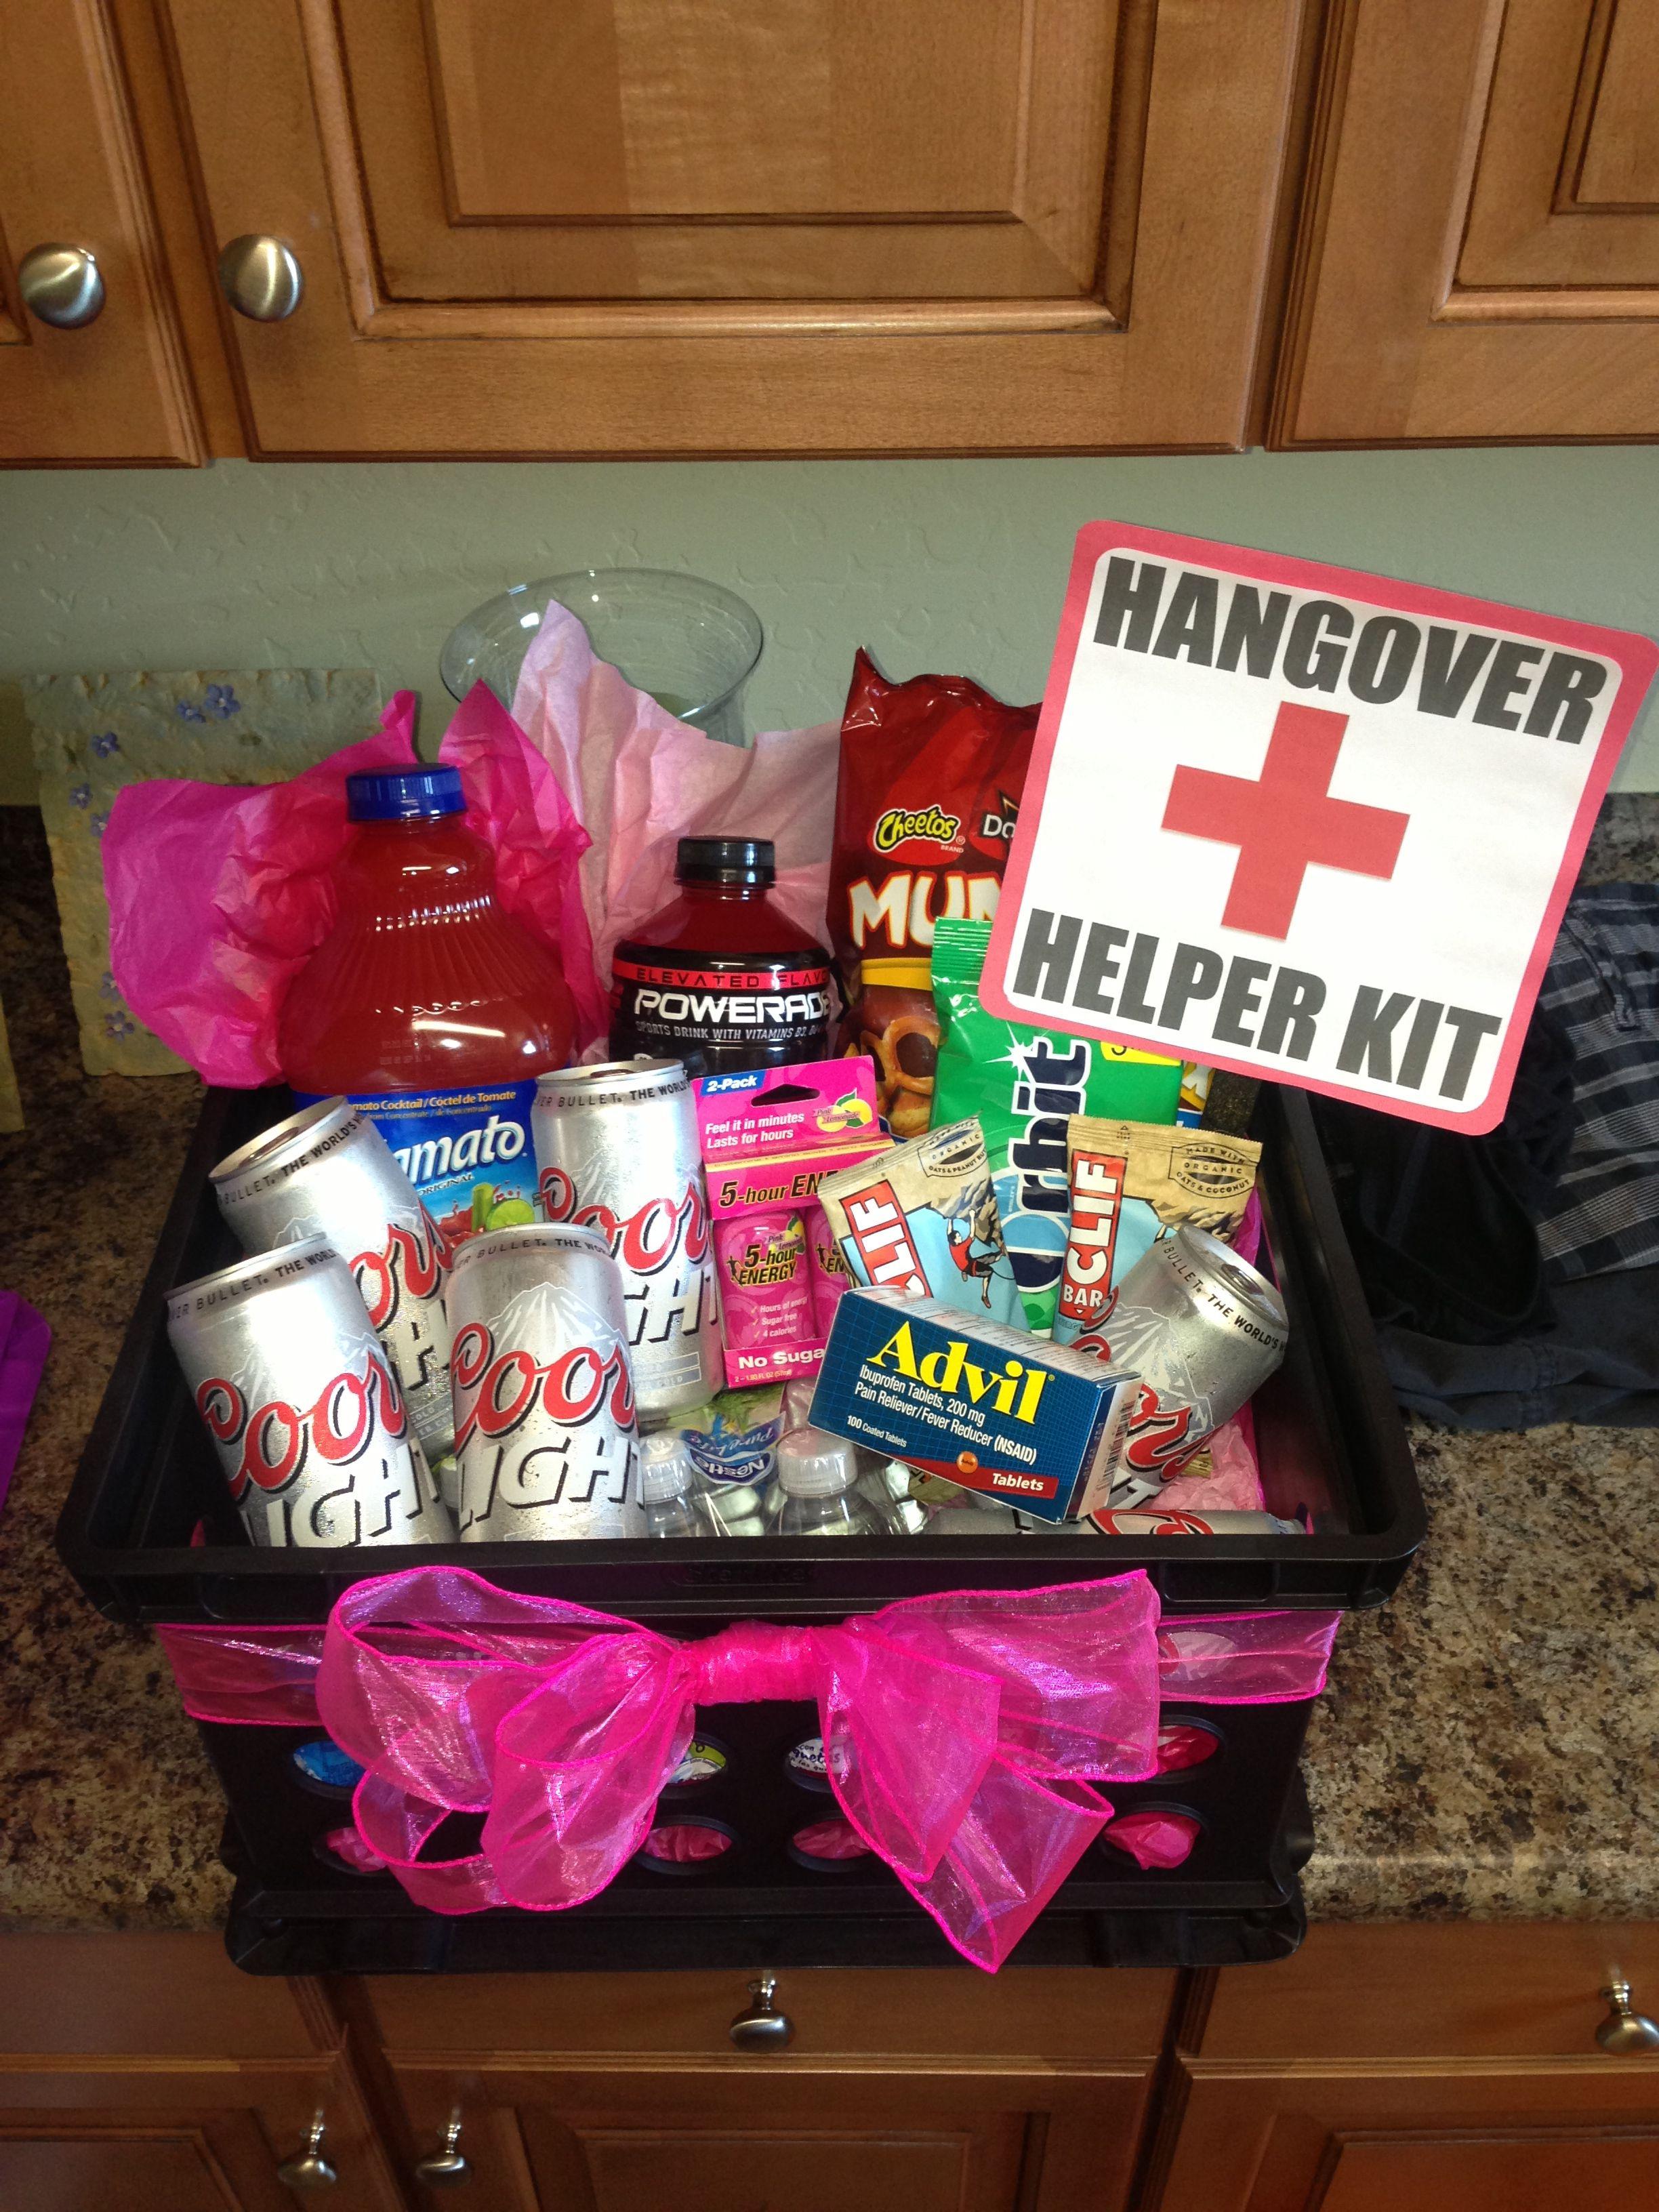 21st birthday hangover recovery kit diy